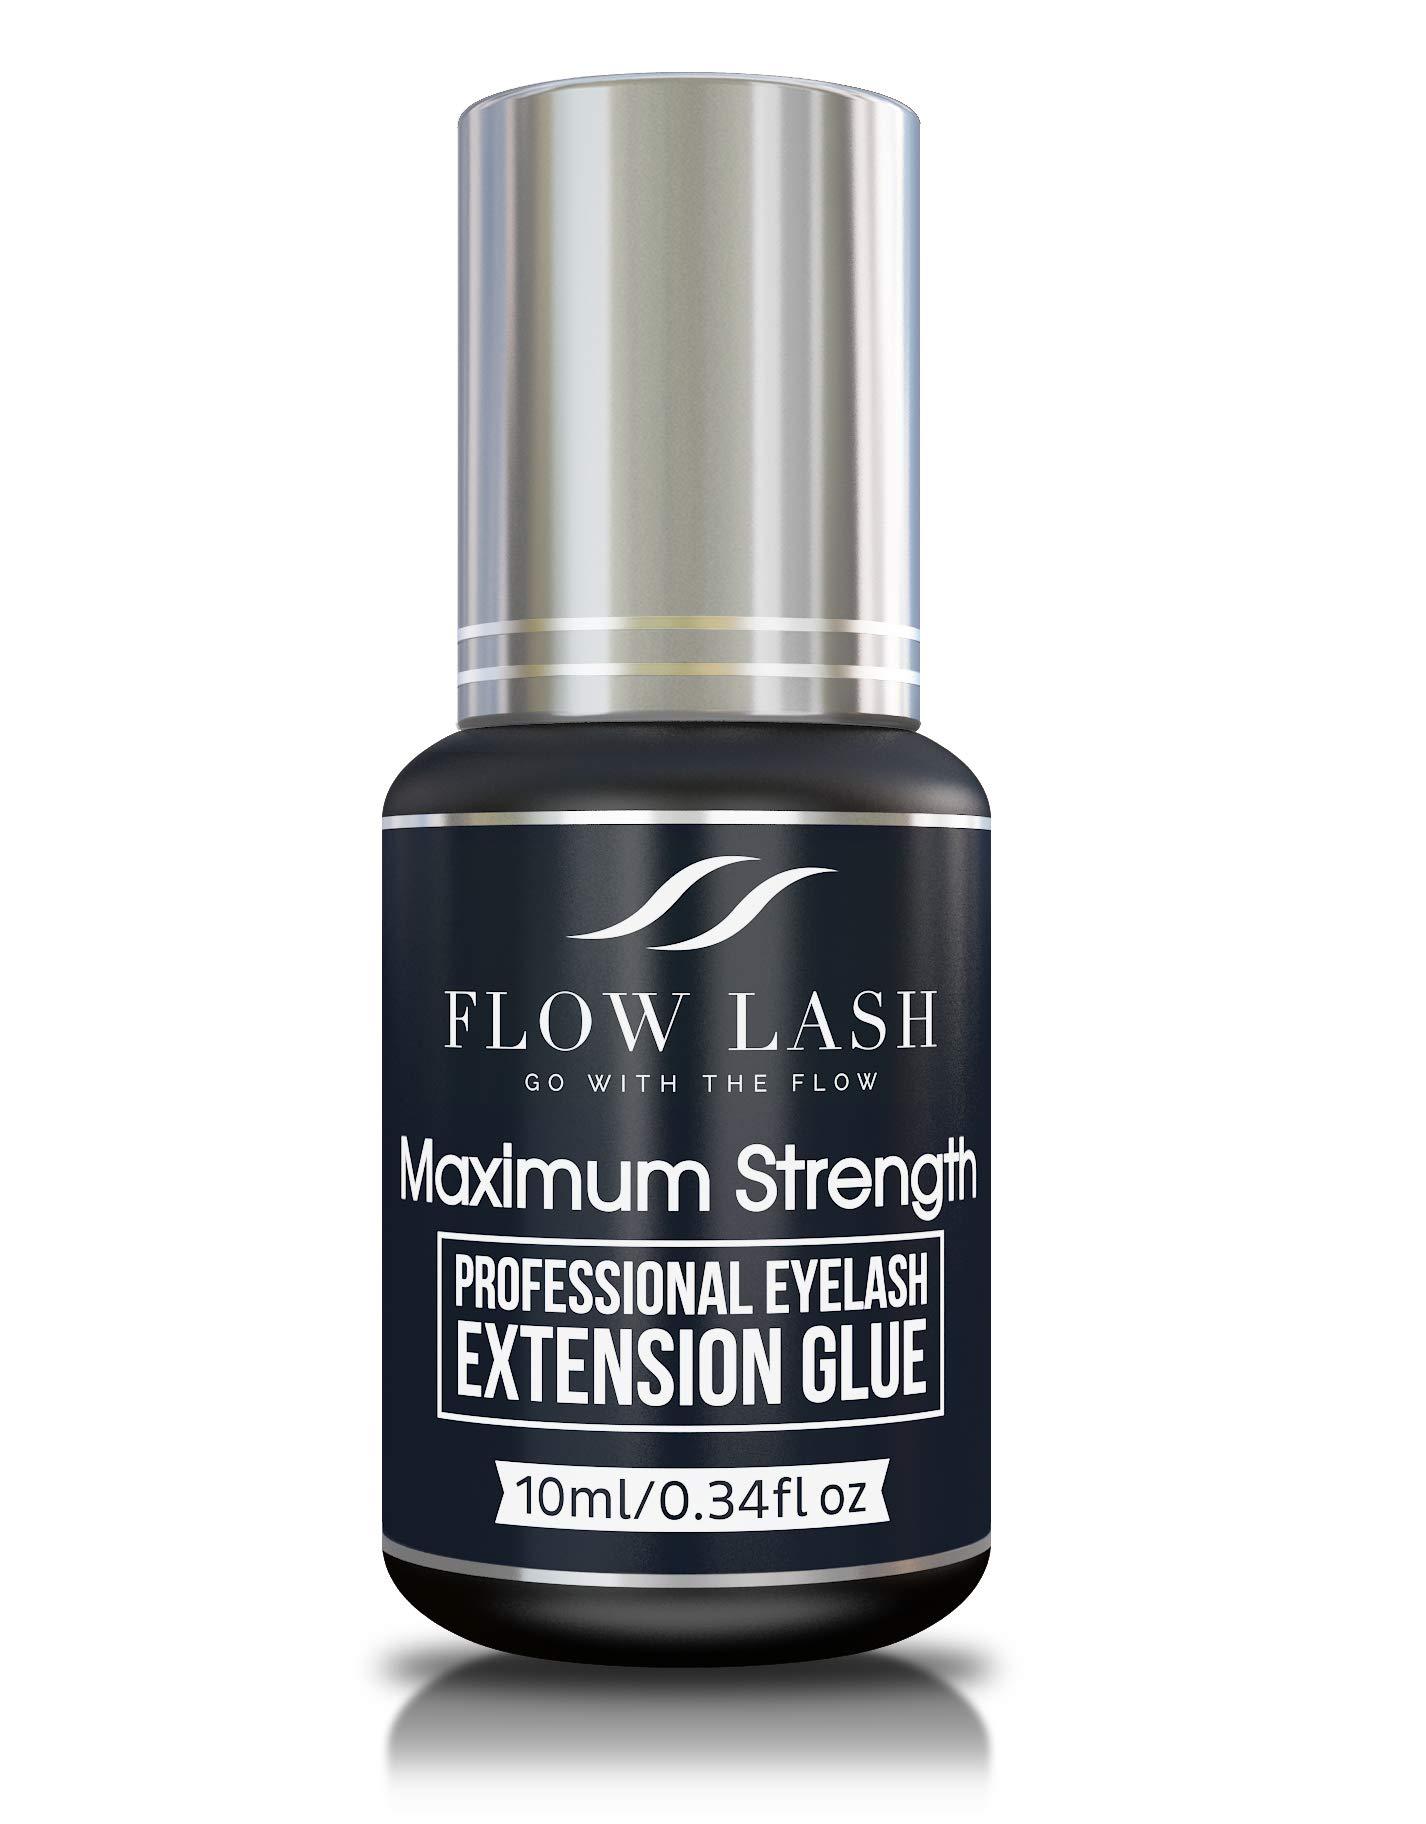 Strongest Eyelash Extension Glue - Maximum Strength, Professional Grade Eyelashes Black Adhesive, Formaldehyde & Latex Free Lashes Supplies, Semi - Permanent Eyelash Glue by Flow Lash, 10mL